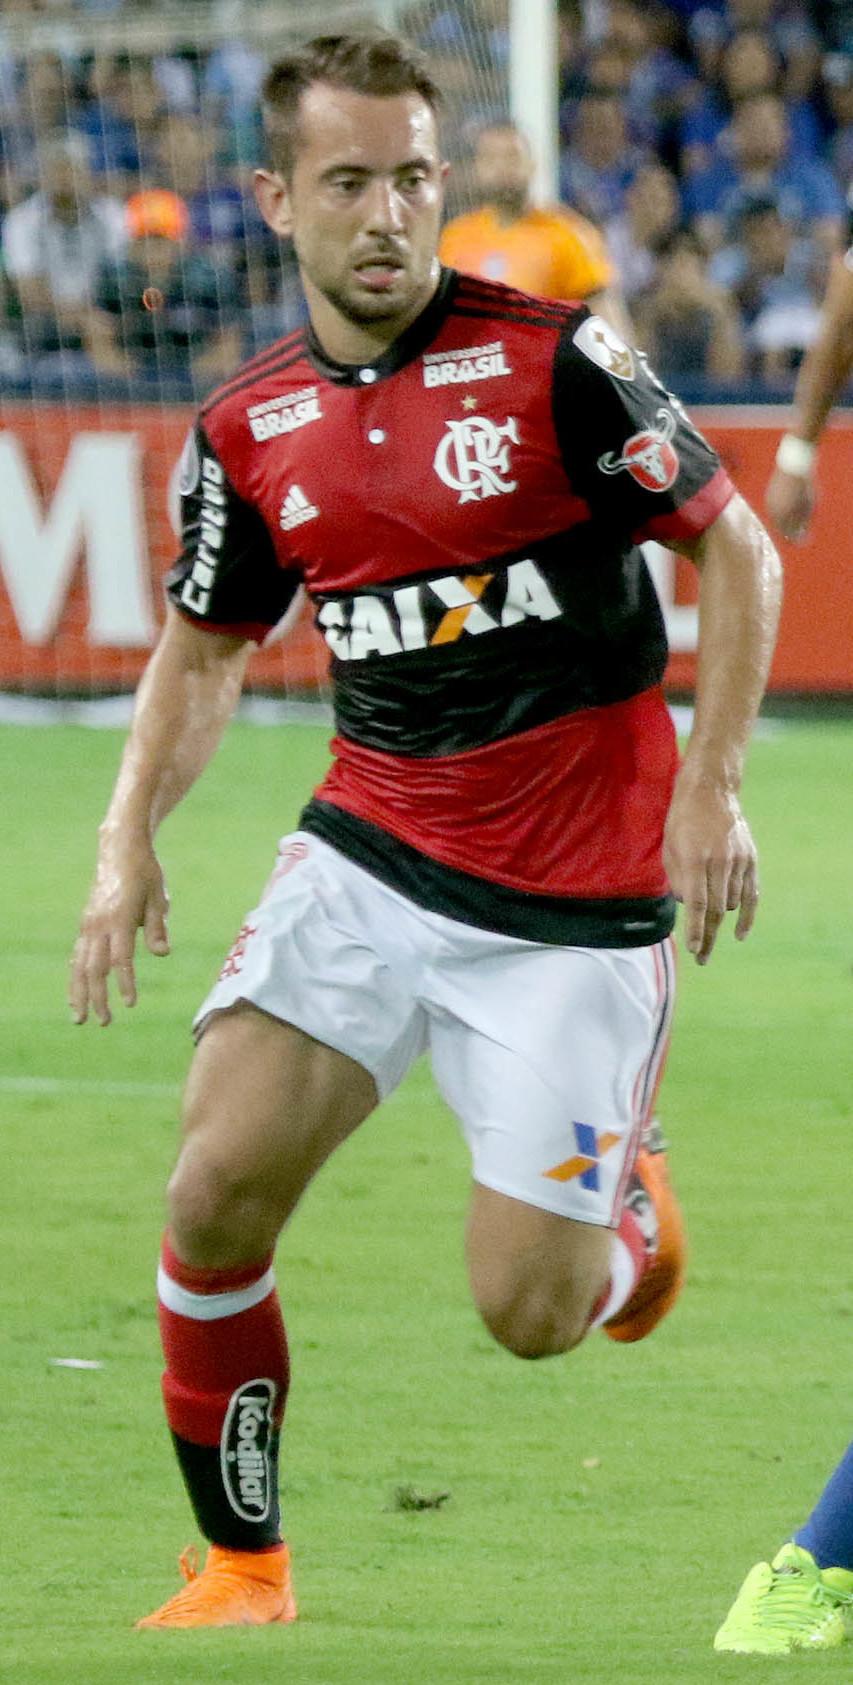 Бразильский защитник фламенго эвертон сильва